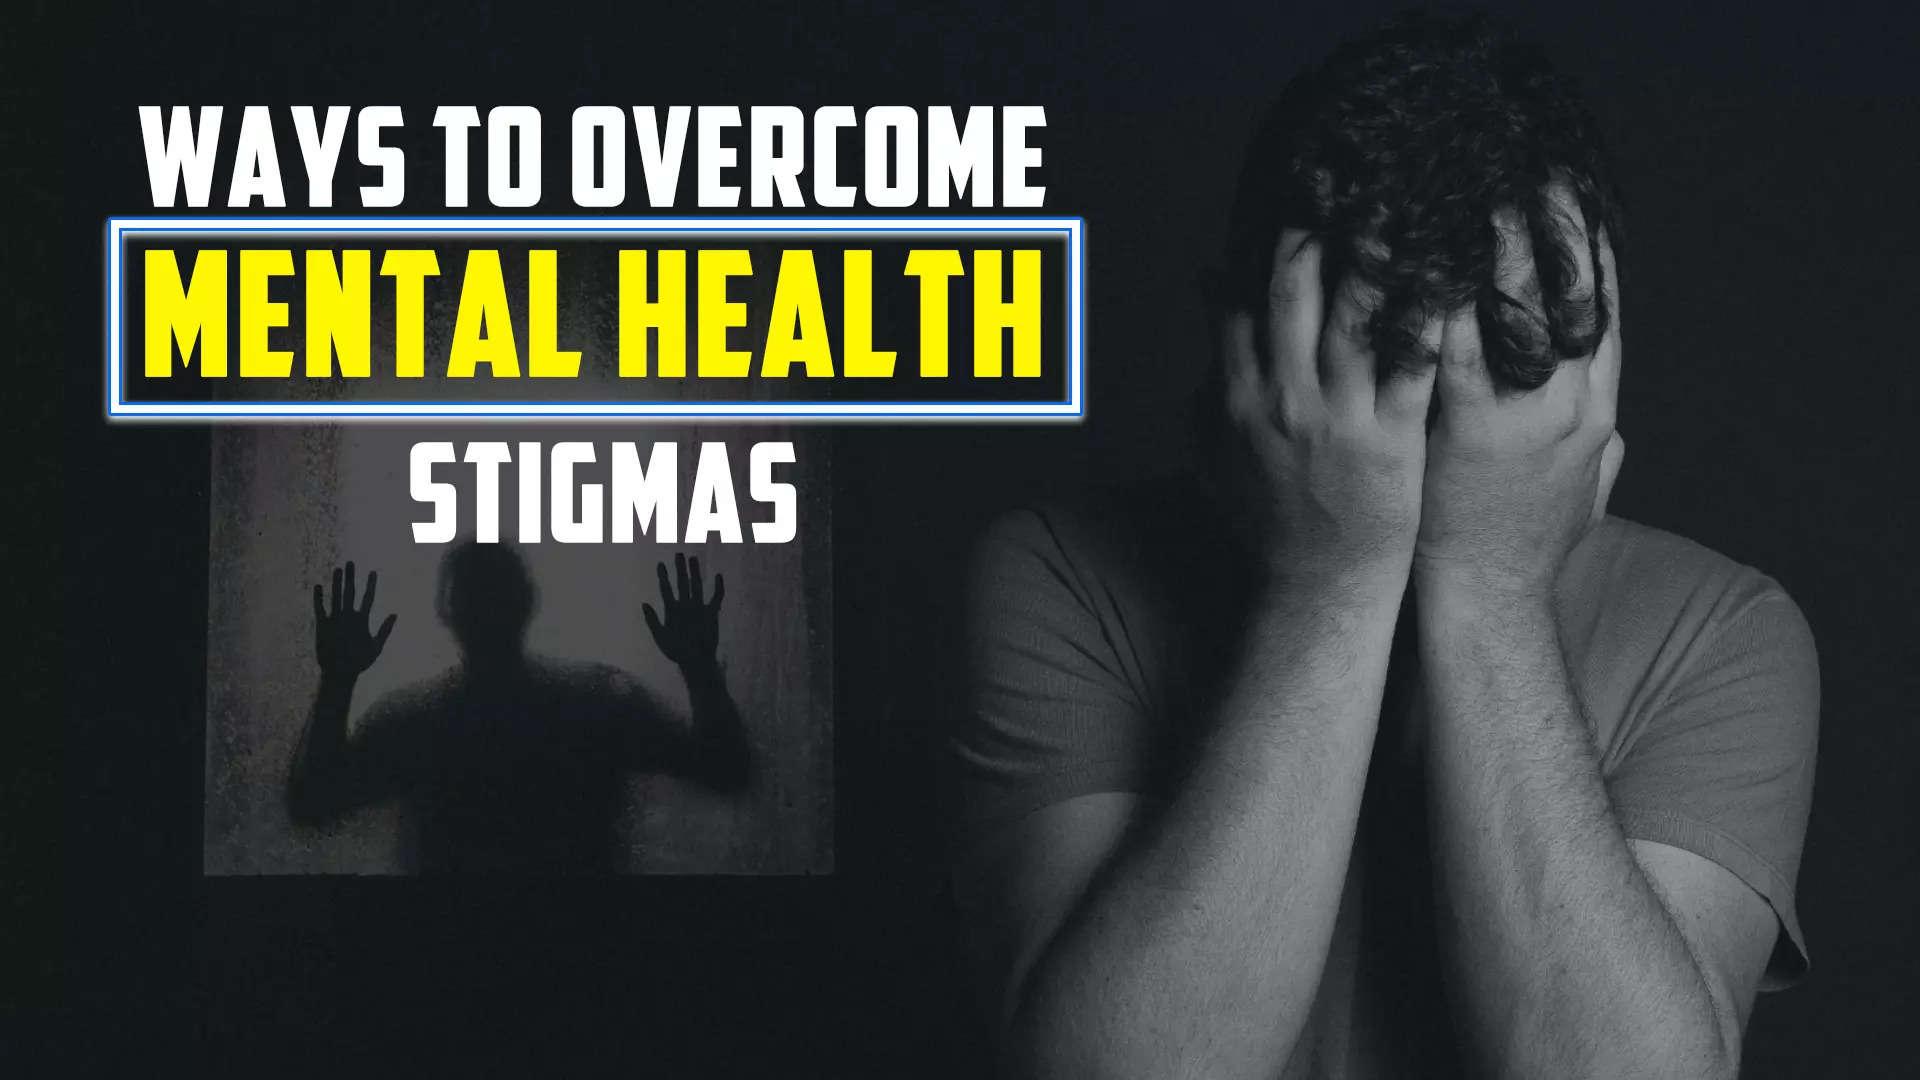 ways-to-overcome-mental-health-stigmas